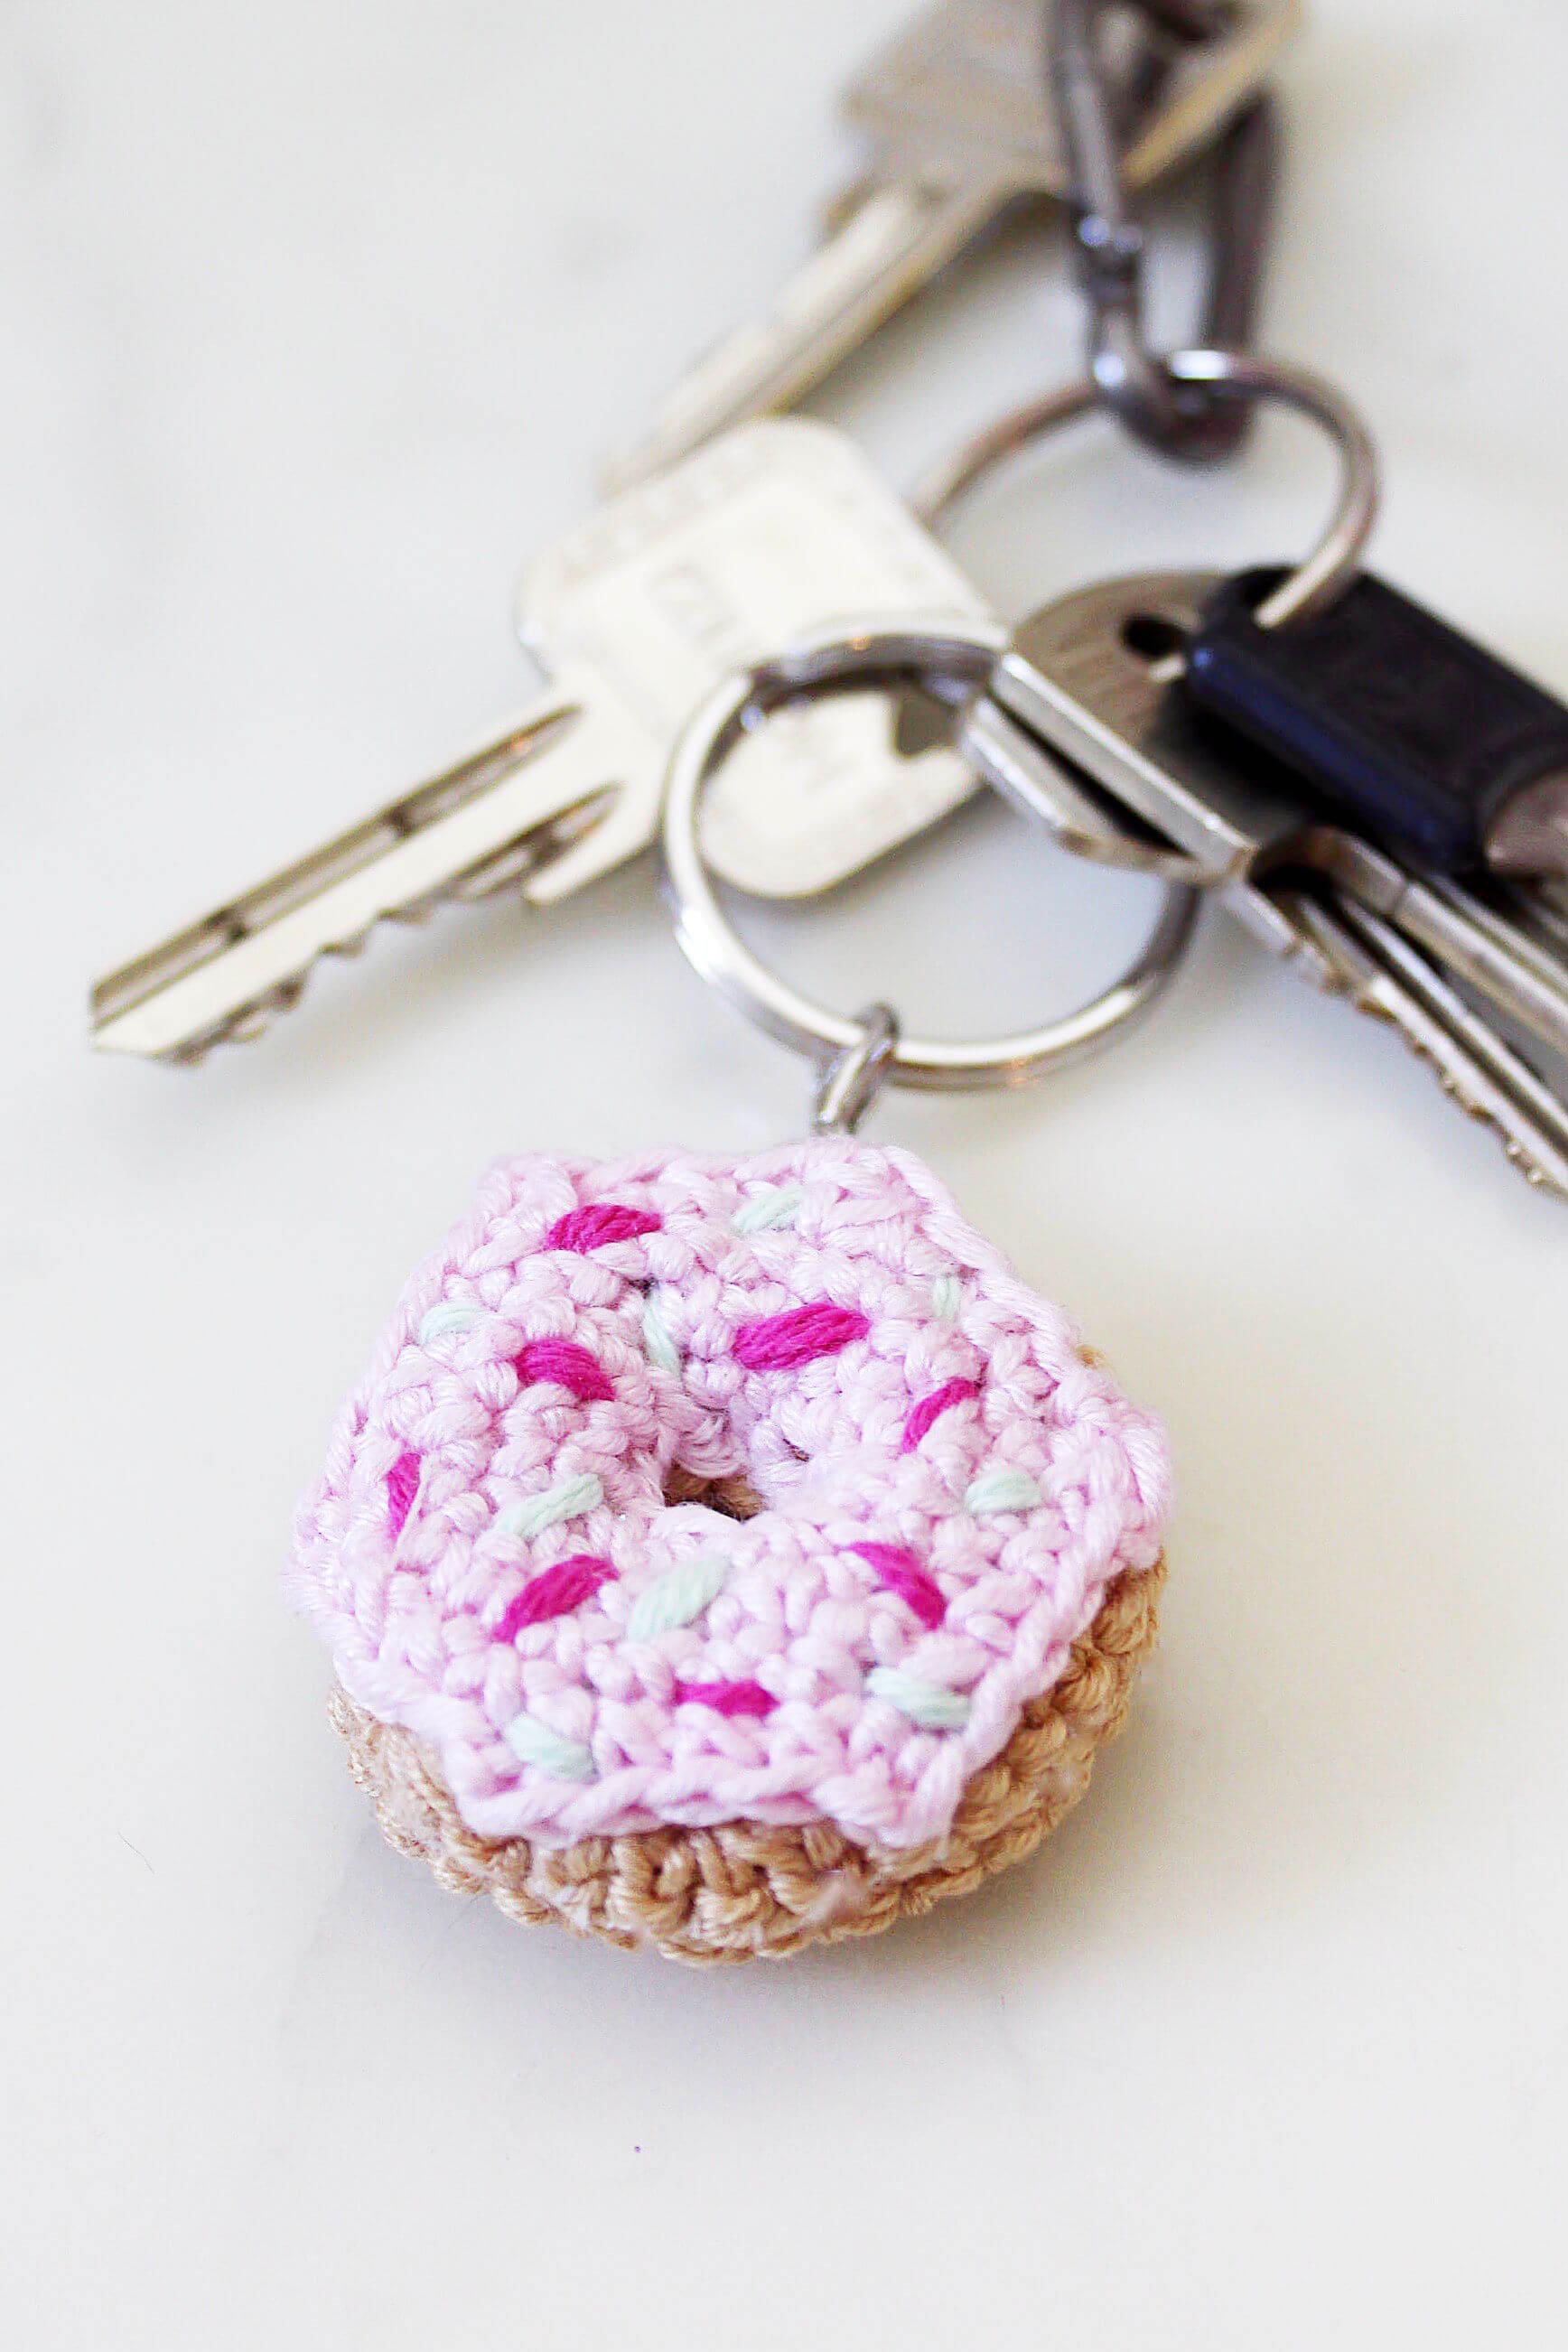 schluesselanhaenger-basteln-haekeln-donut-anleitung-diy-blog